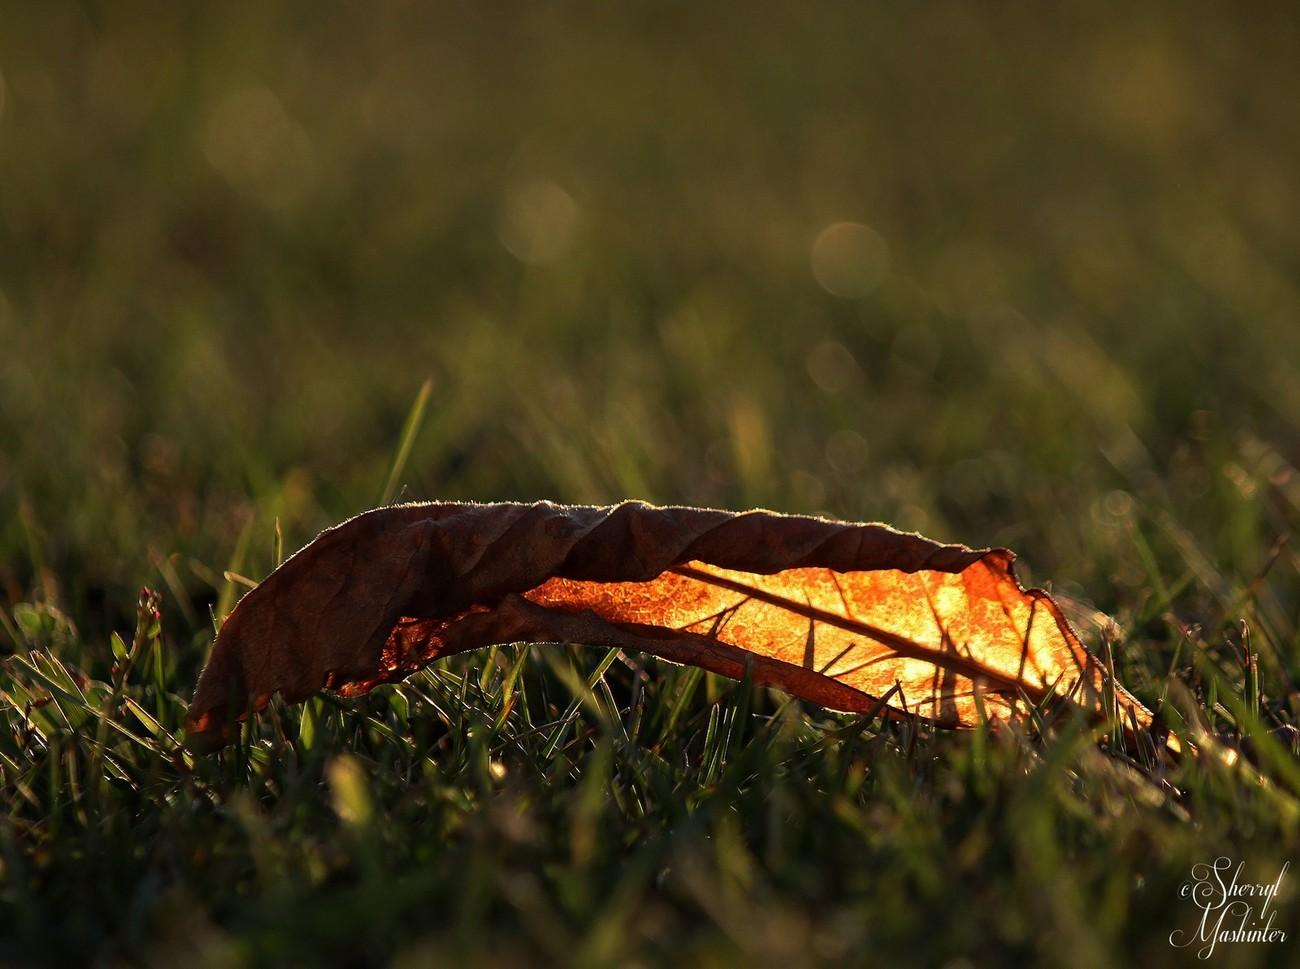 Sun Through the Veins of a Leaf